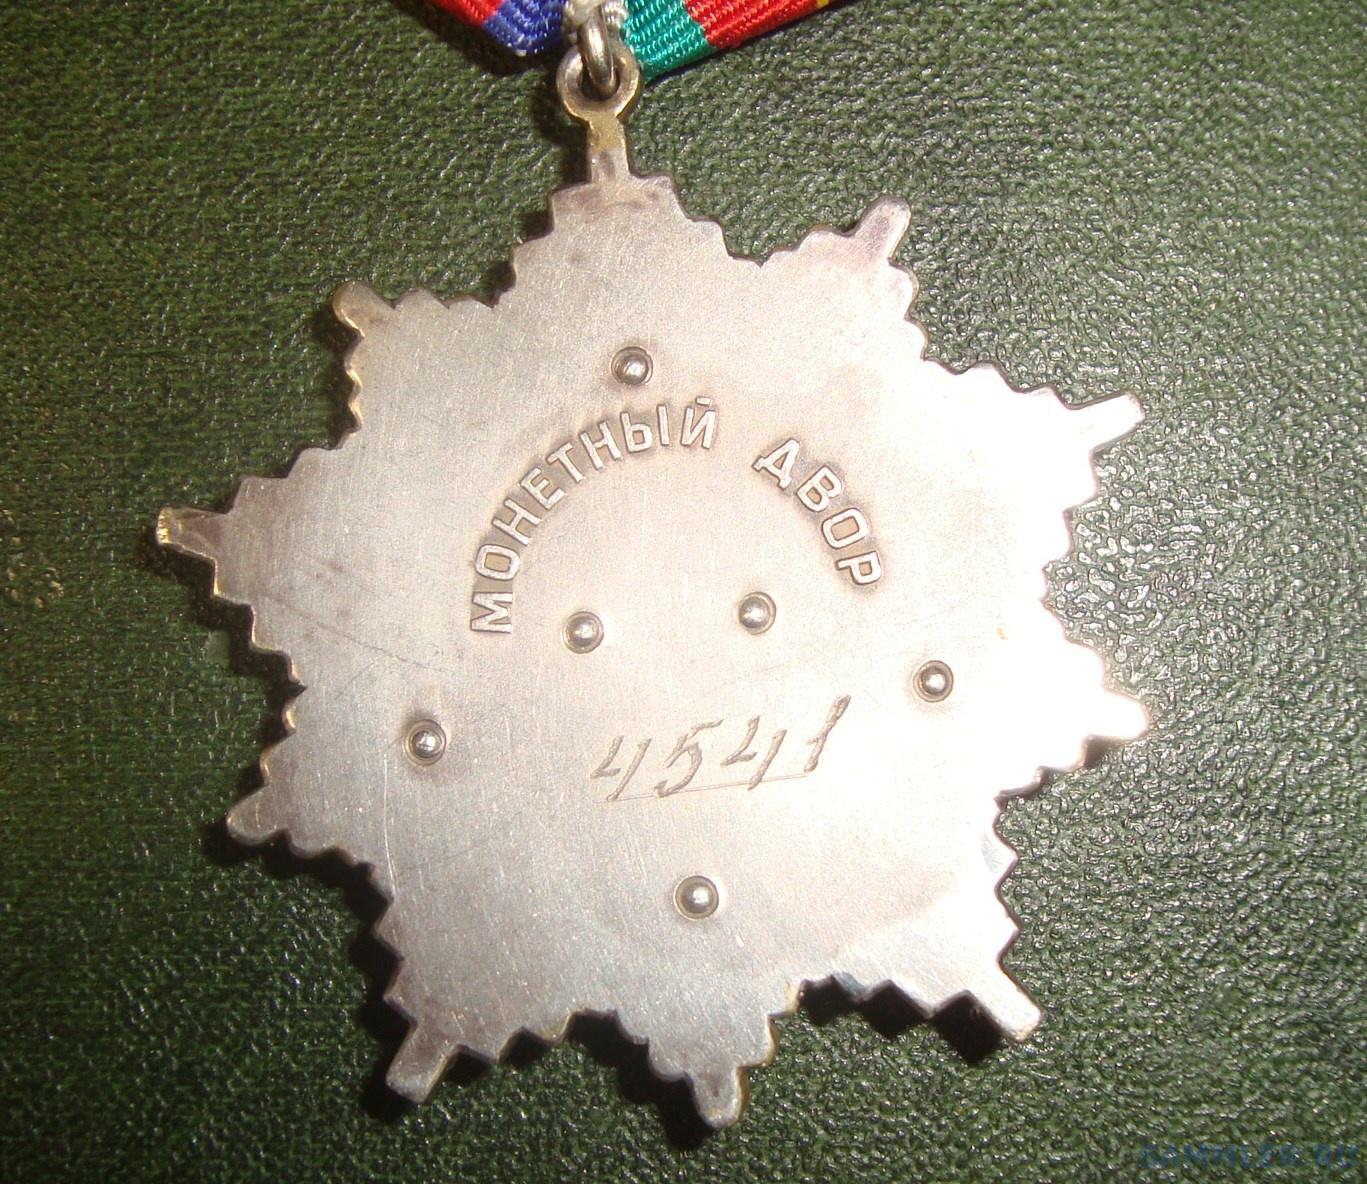 DSC07088.JPG